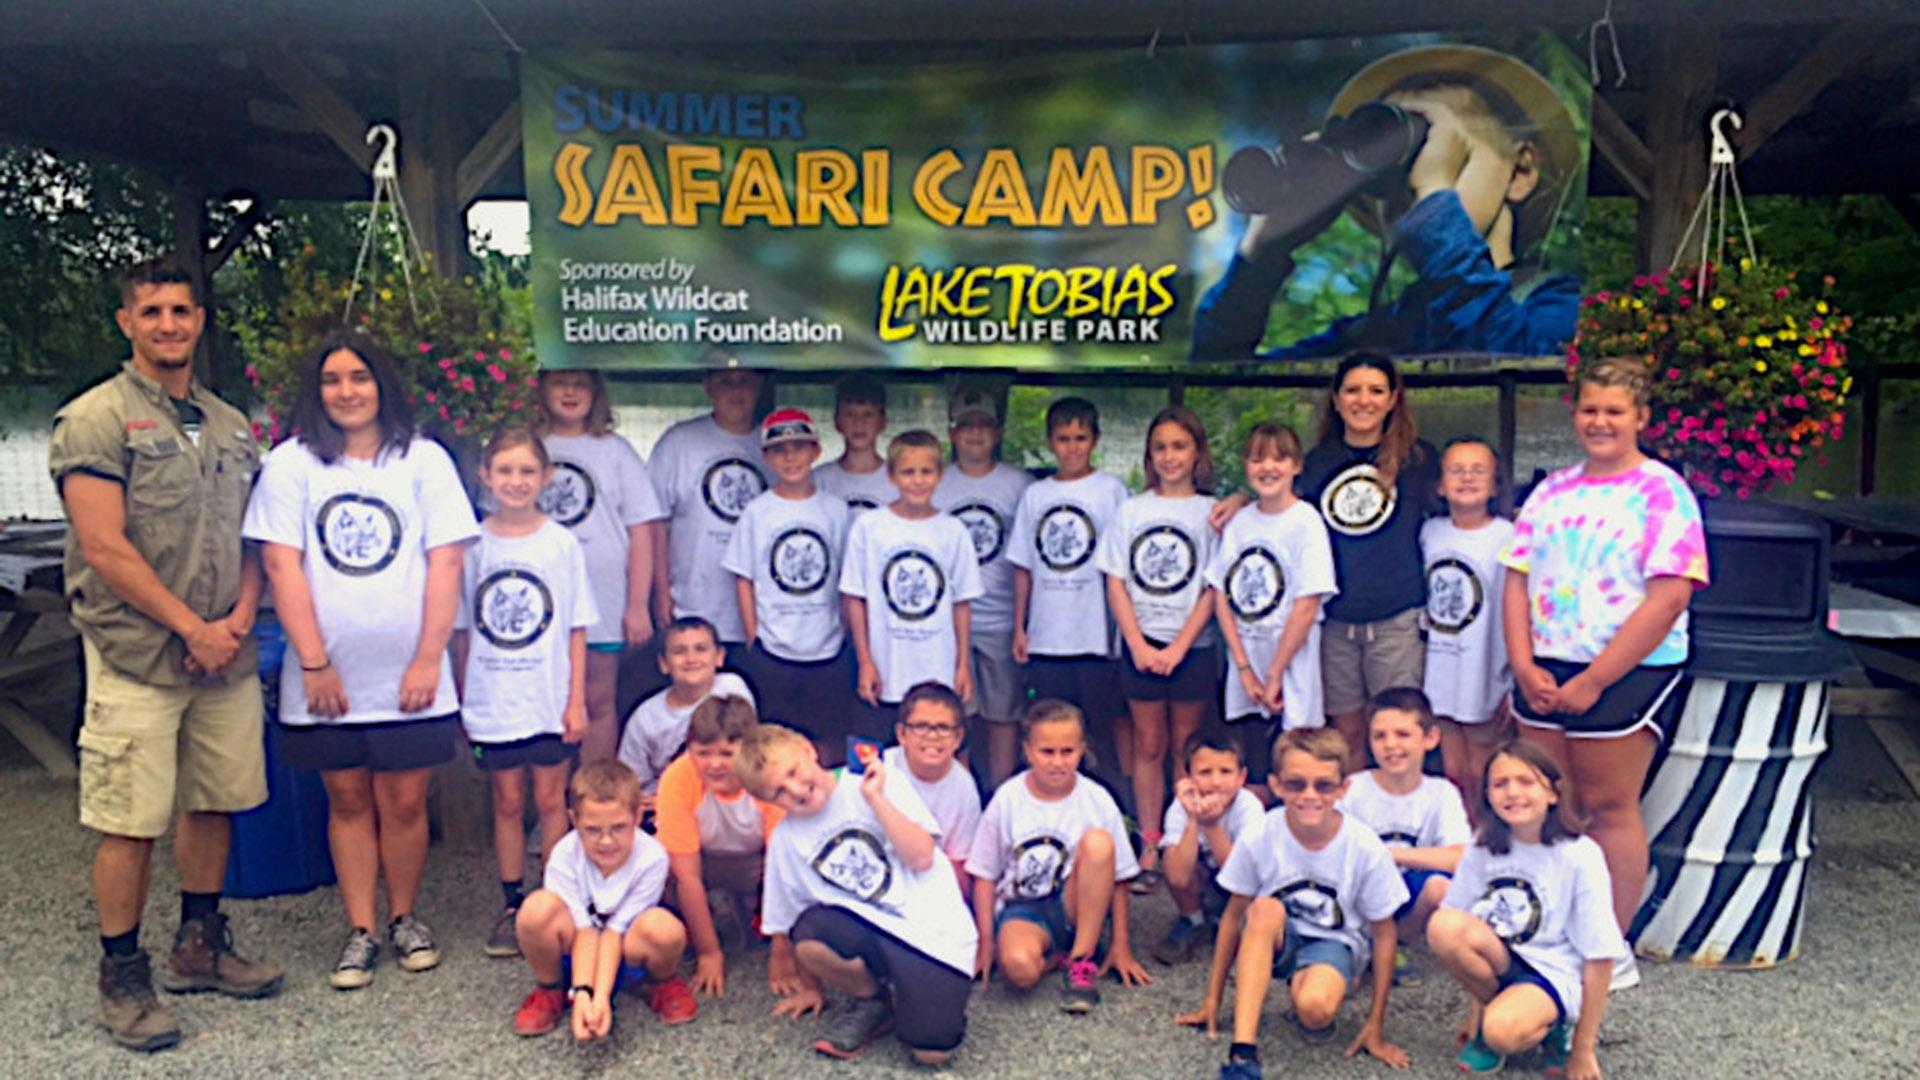 Lake Tobias Wildlife Park summer camp